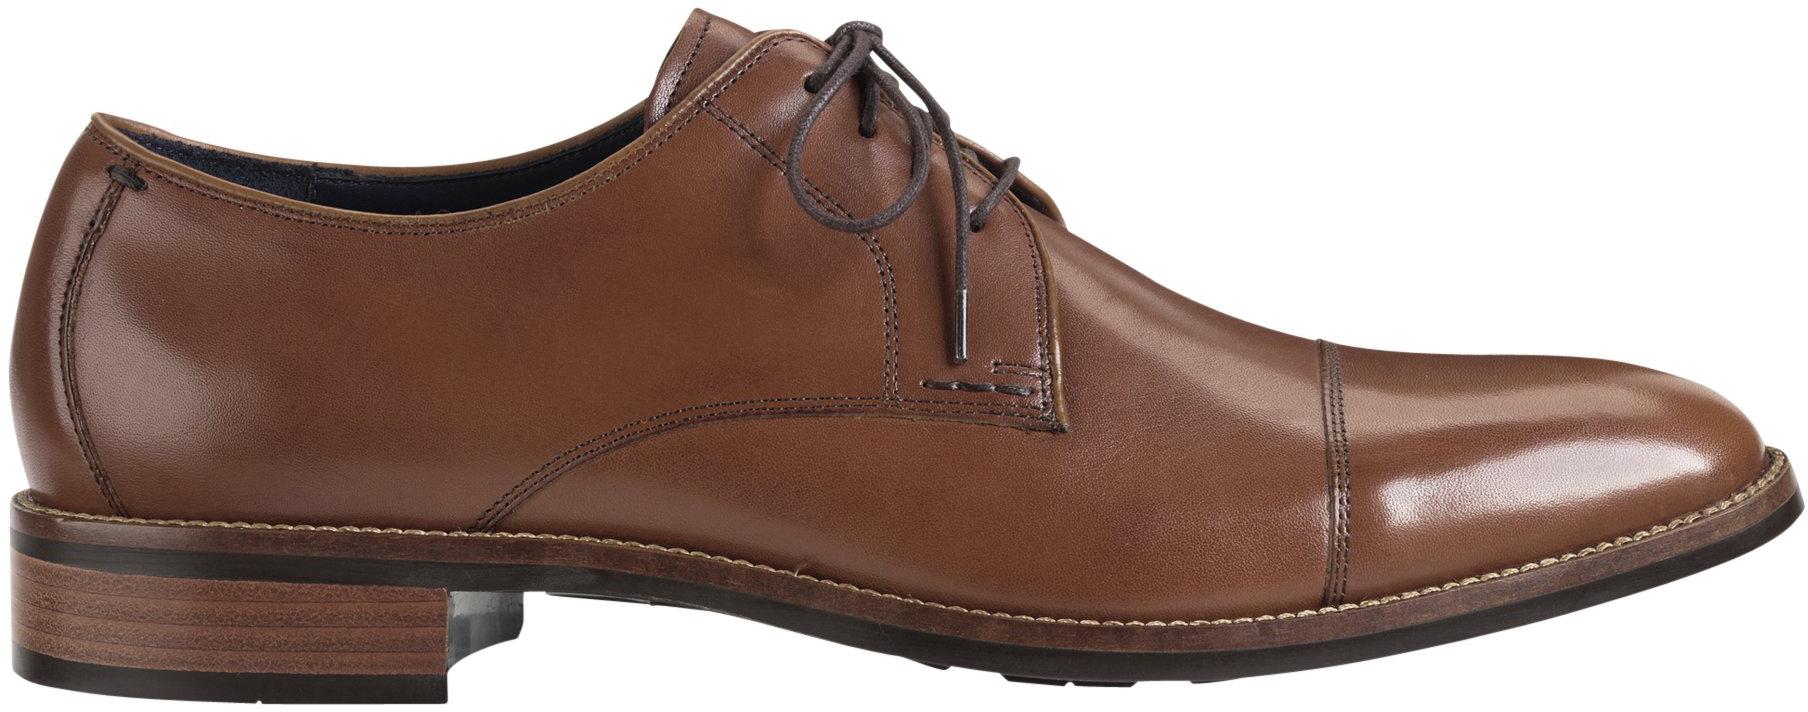 76bc0bfebc06 Cole Haan Men s Lenox Hill Cap Ox C11632 British Tan - The Shoe Mart